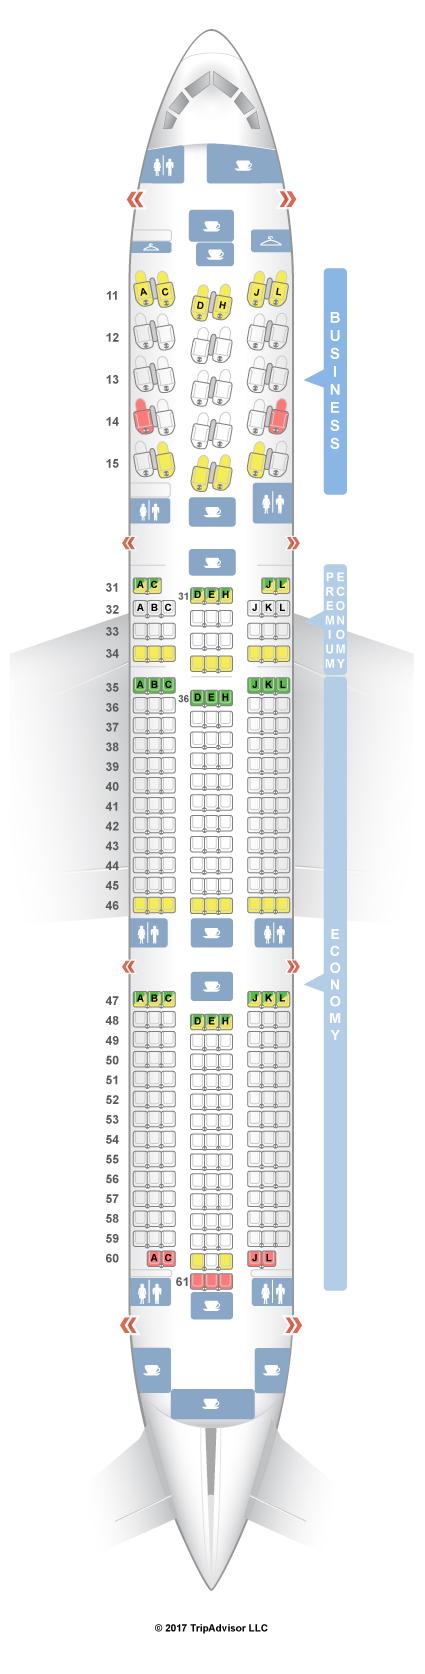 Norwegian 787 9 Dreamliner Seat Map Brokeasshome Com